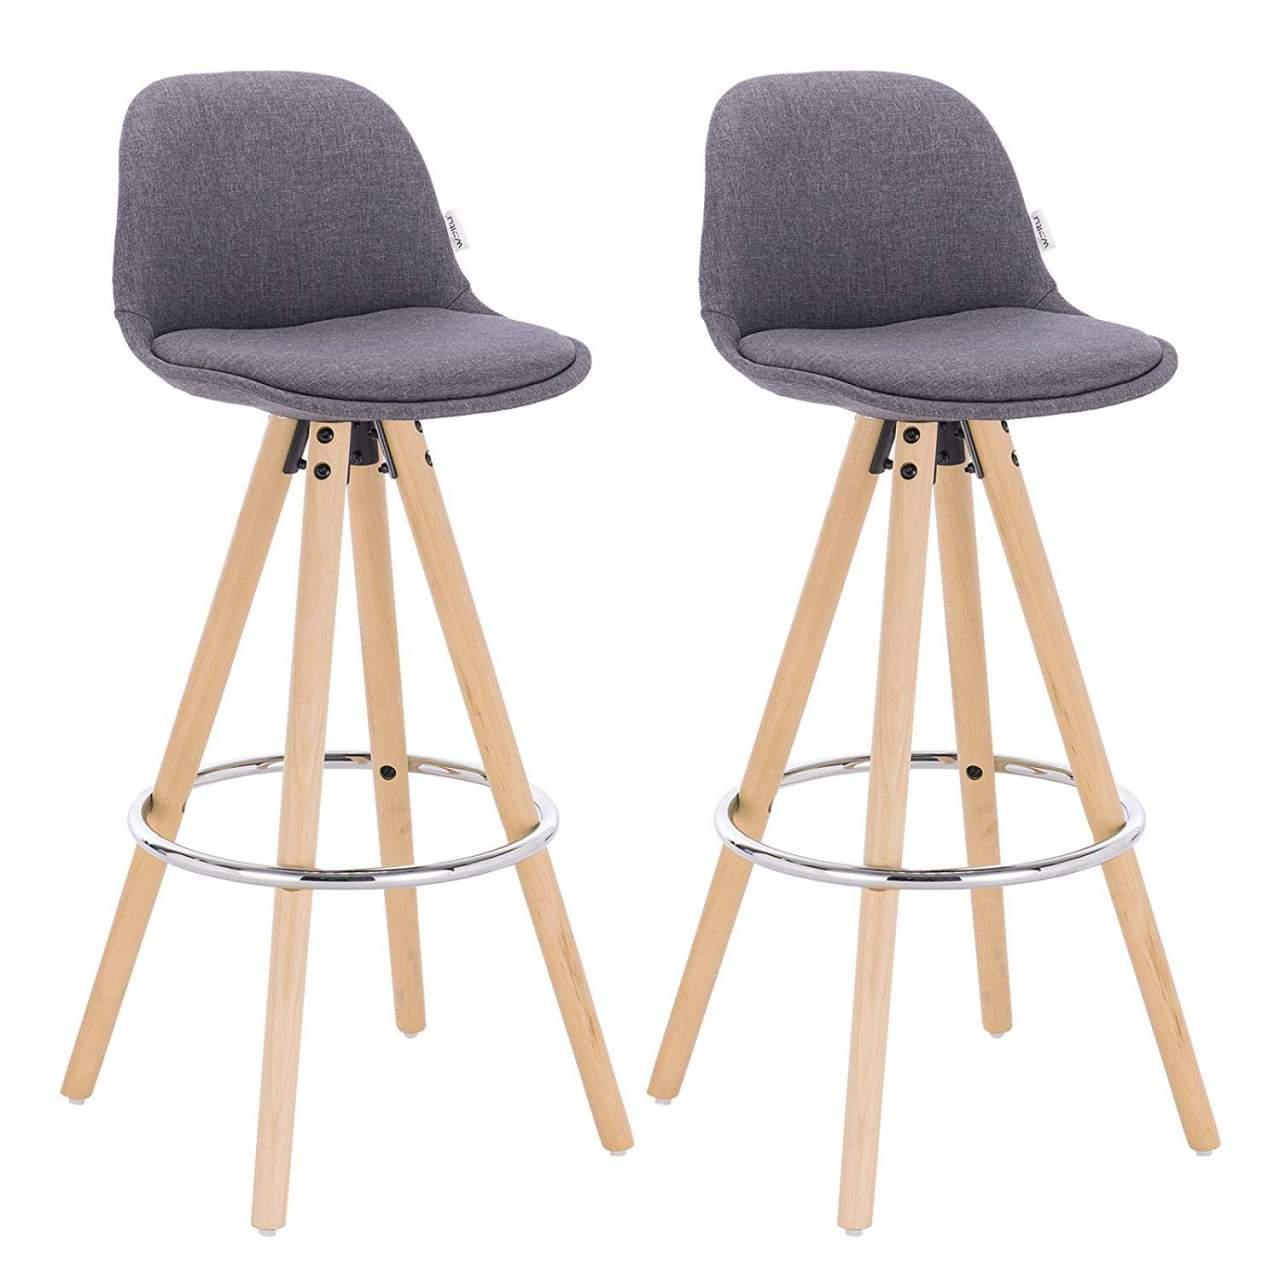 Barhocker 2er Set Barstuhl Aus Leinen Holzgestell Mit Lehne Fussstutze Design Stuhl Kuchenstuhl Optimal Komfort Woltu Eu